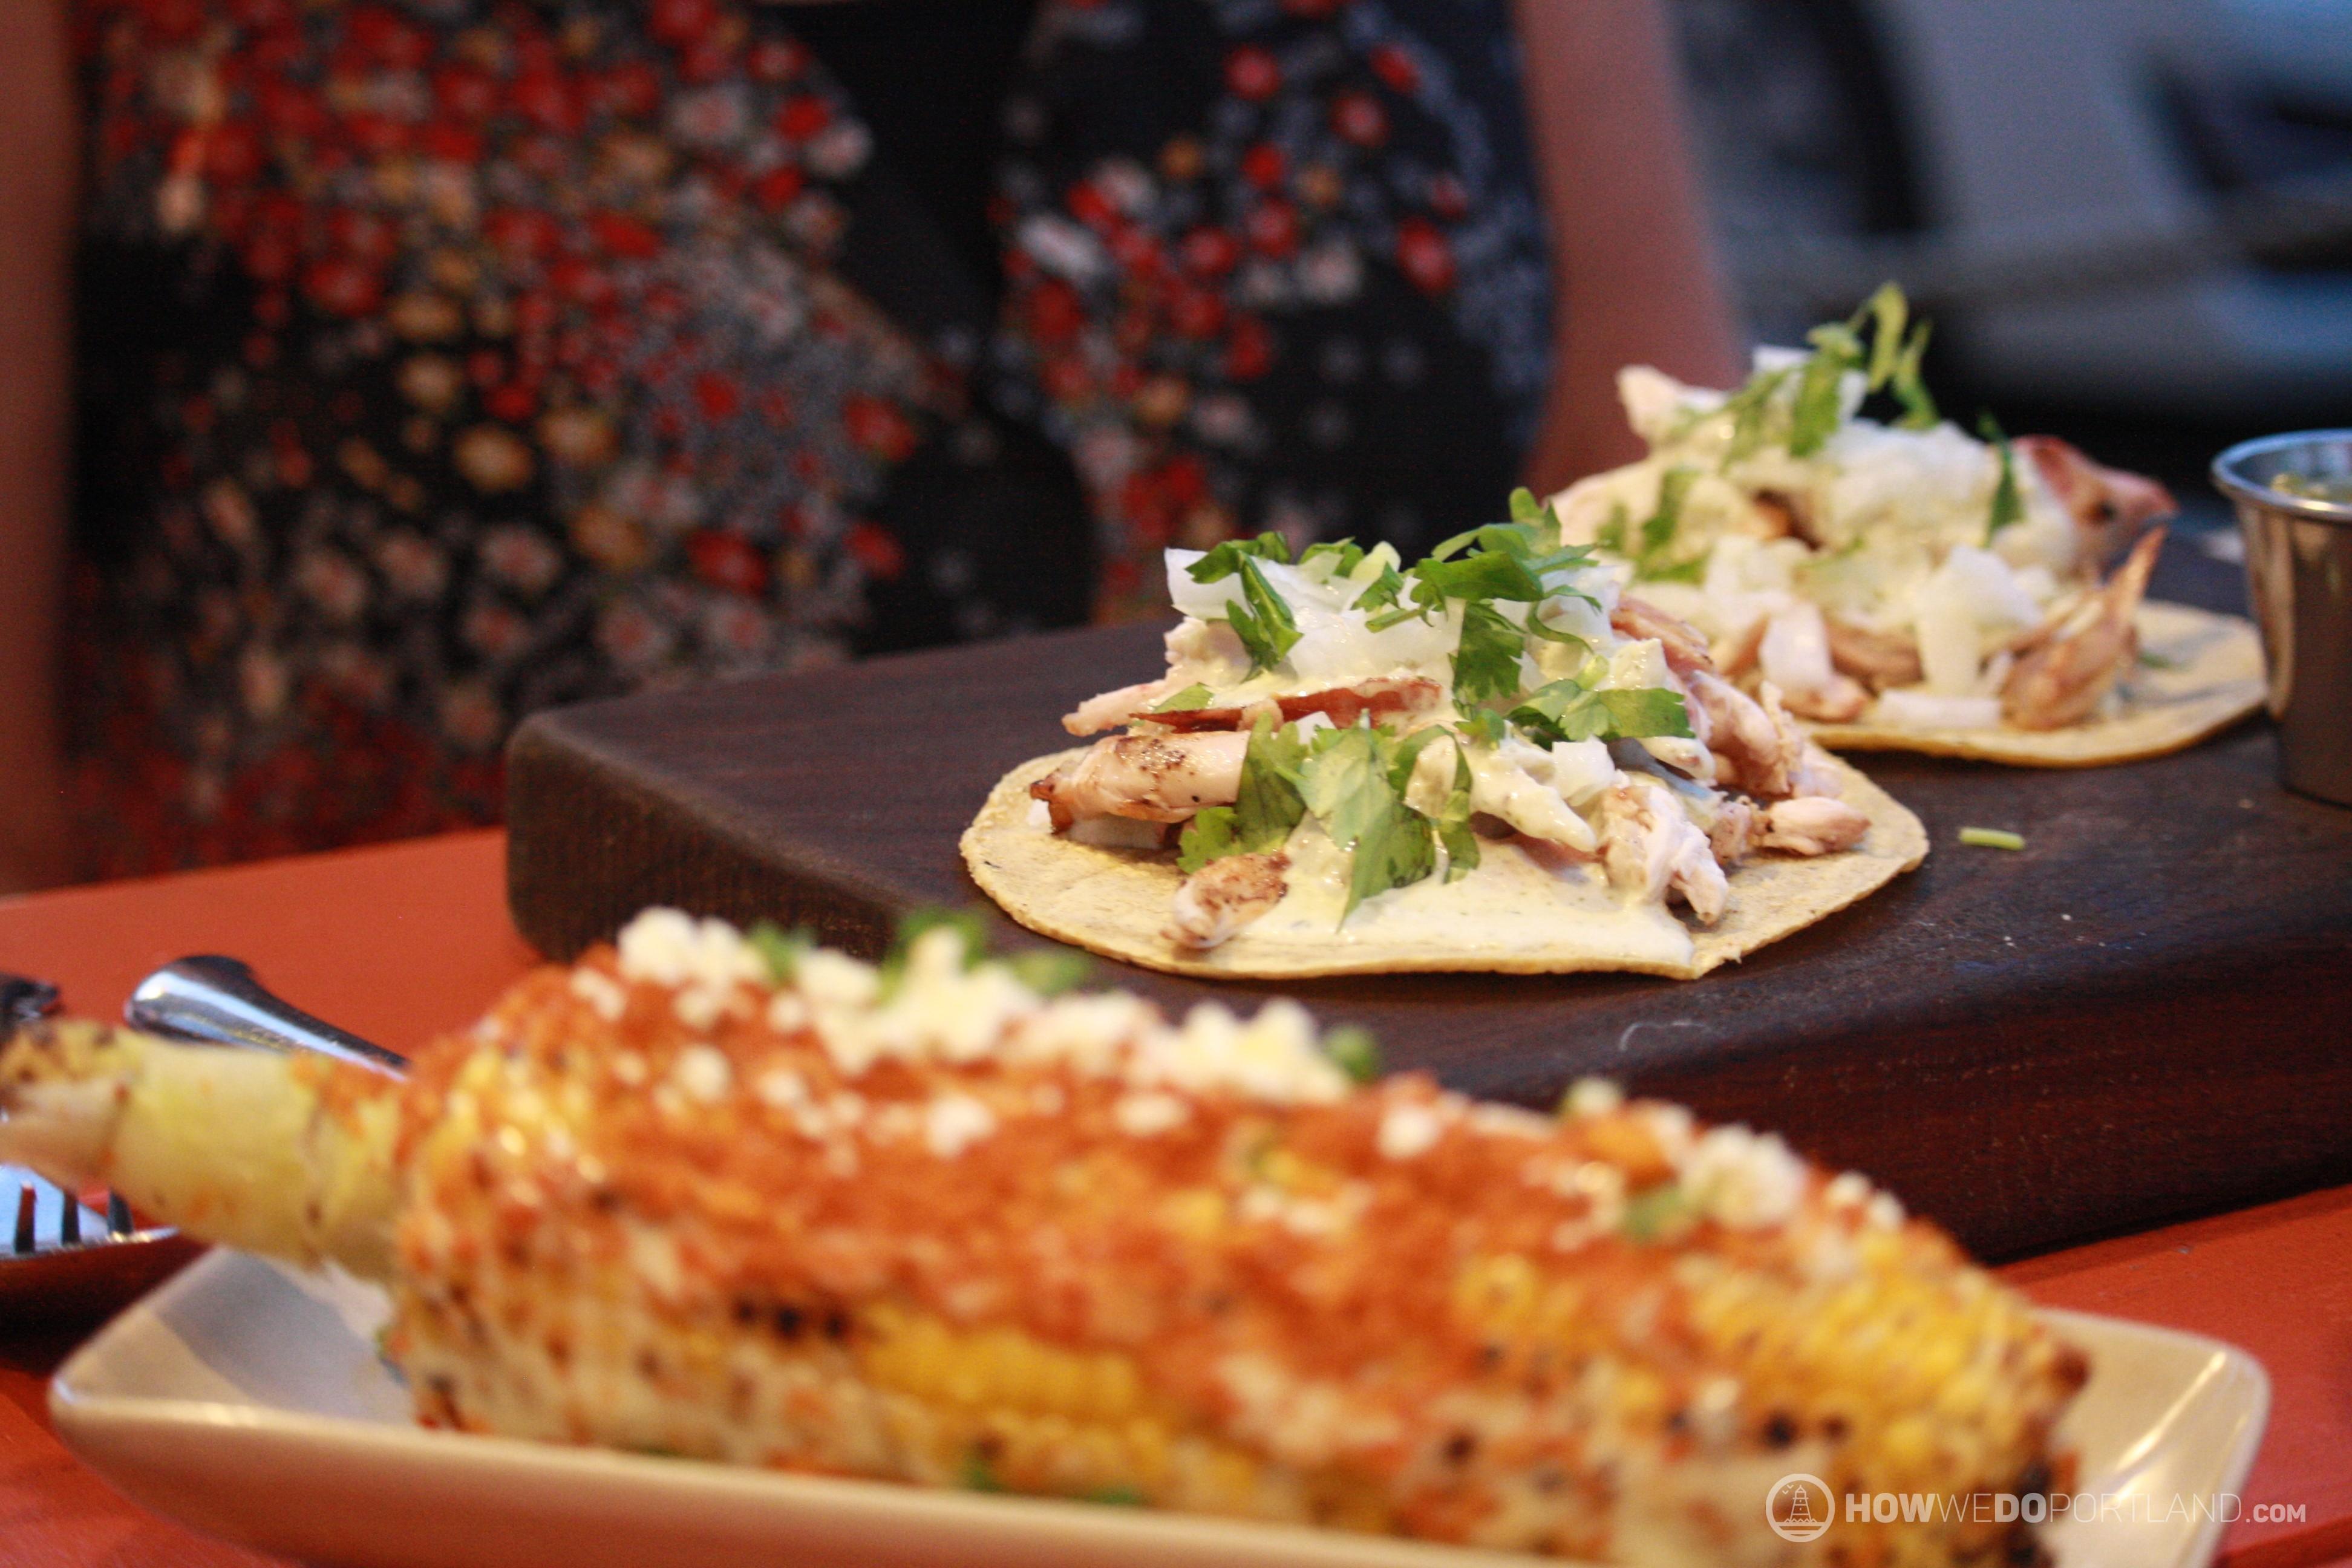 Terlingua tacos & street corn